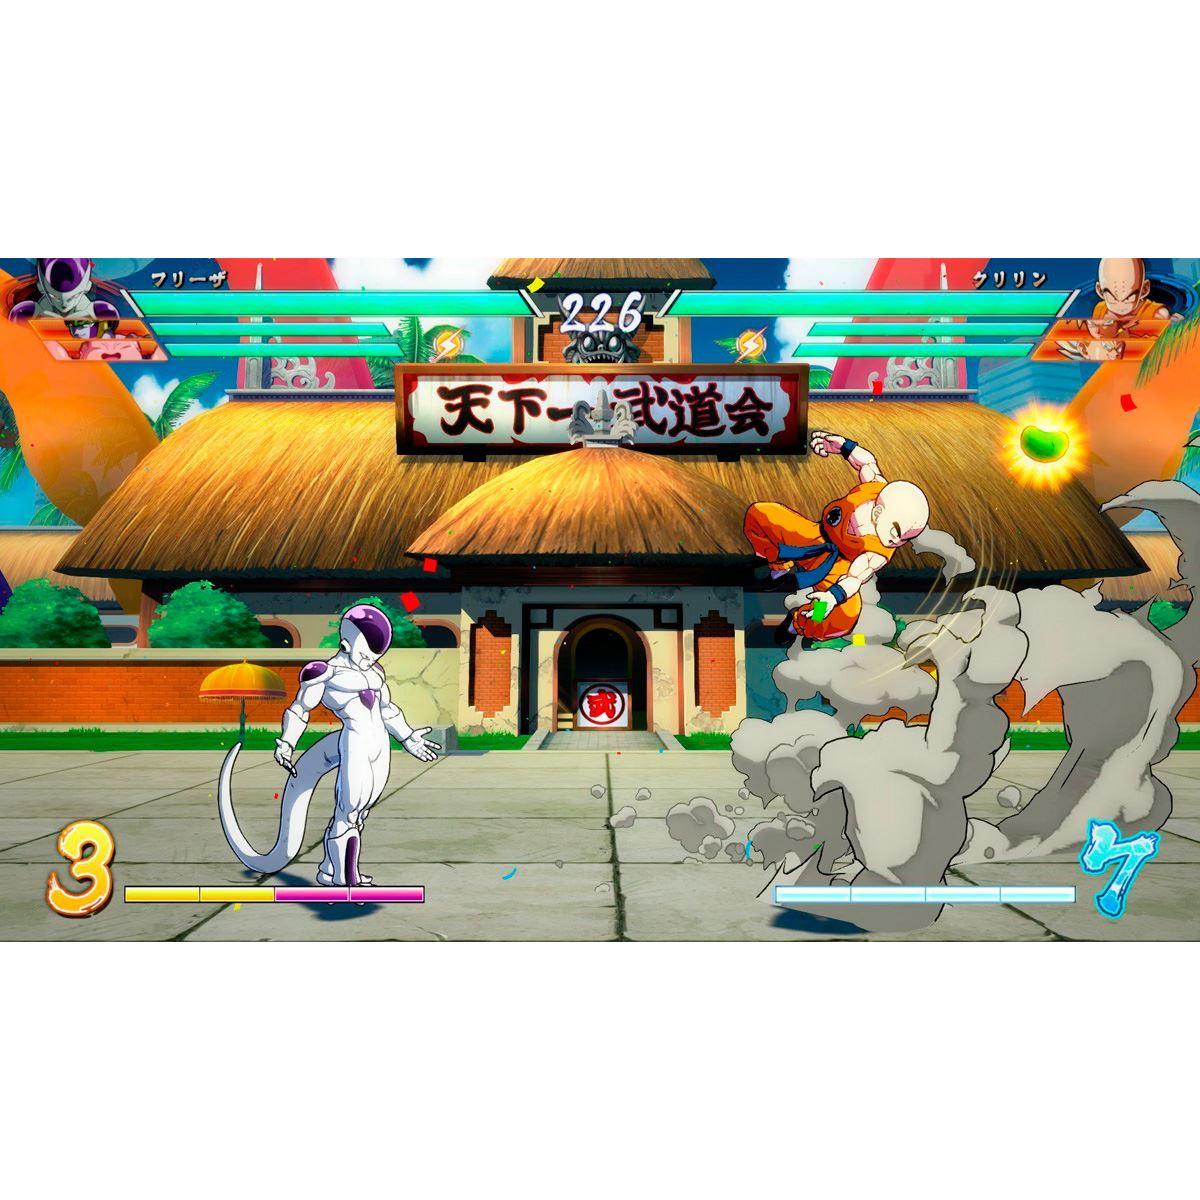 Xbox one dragon ball fighterz  - Sanborns